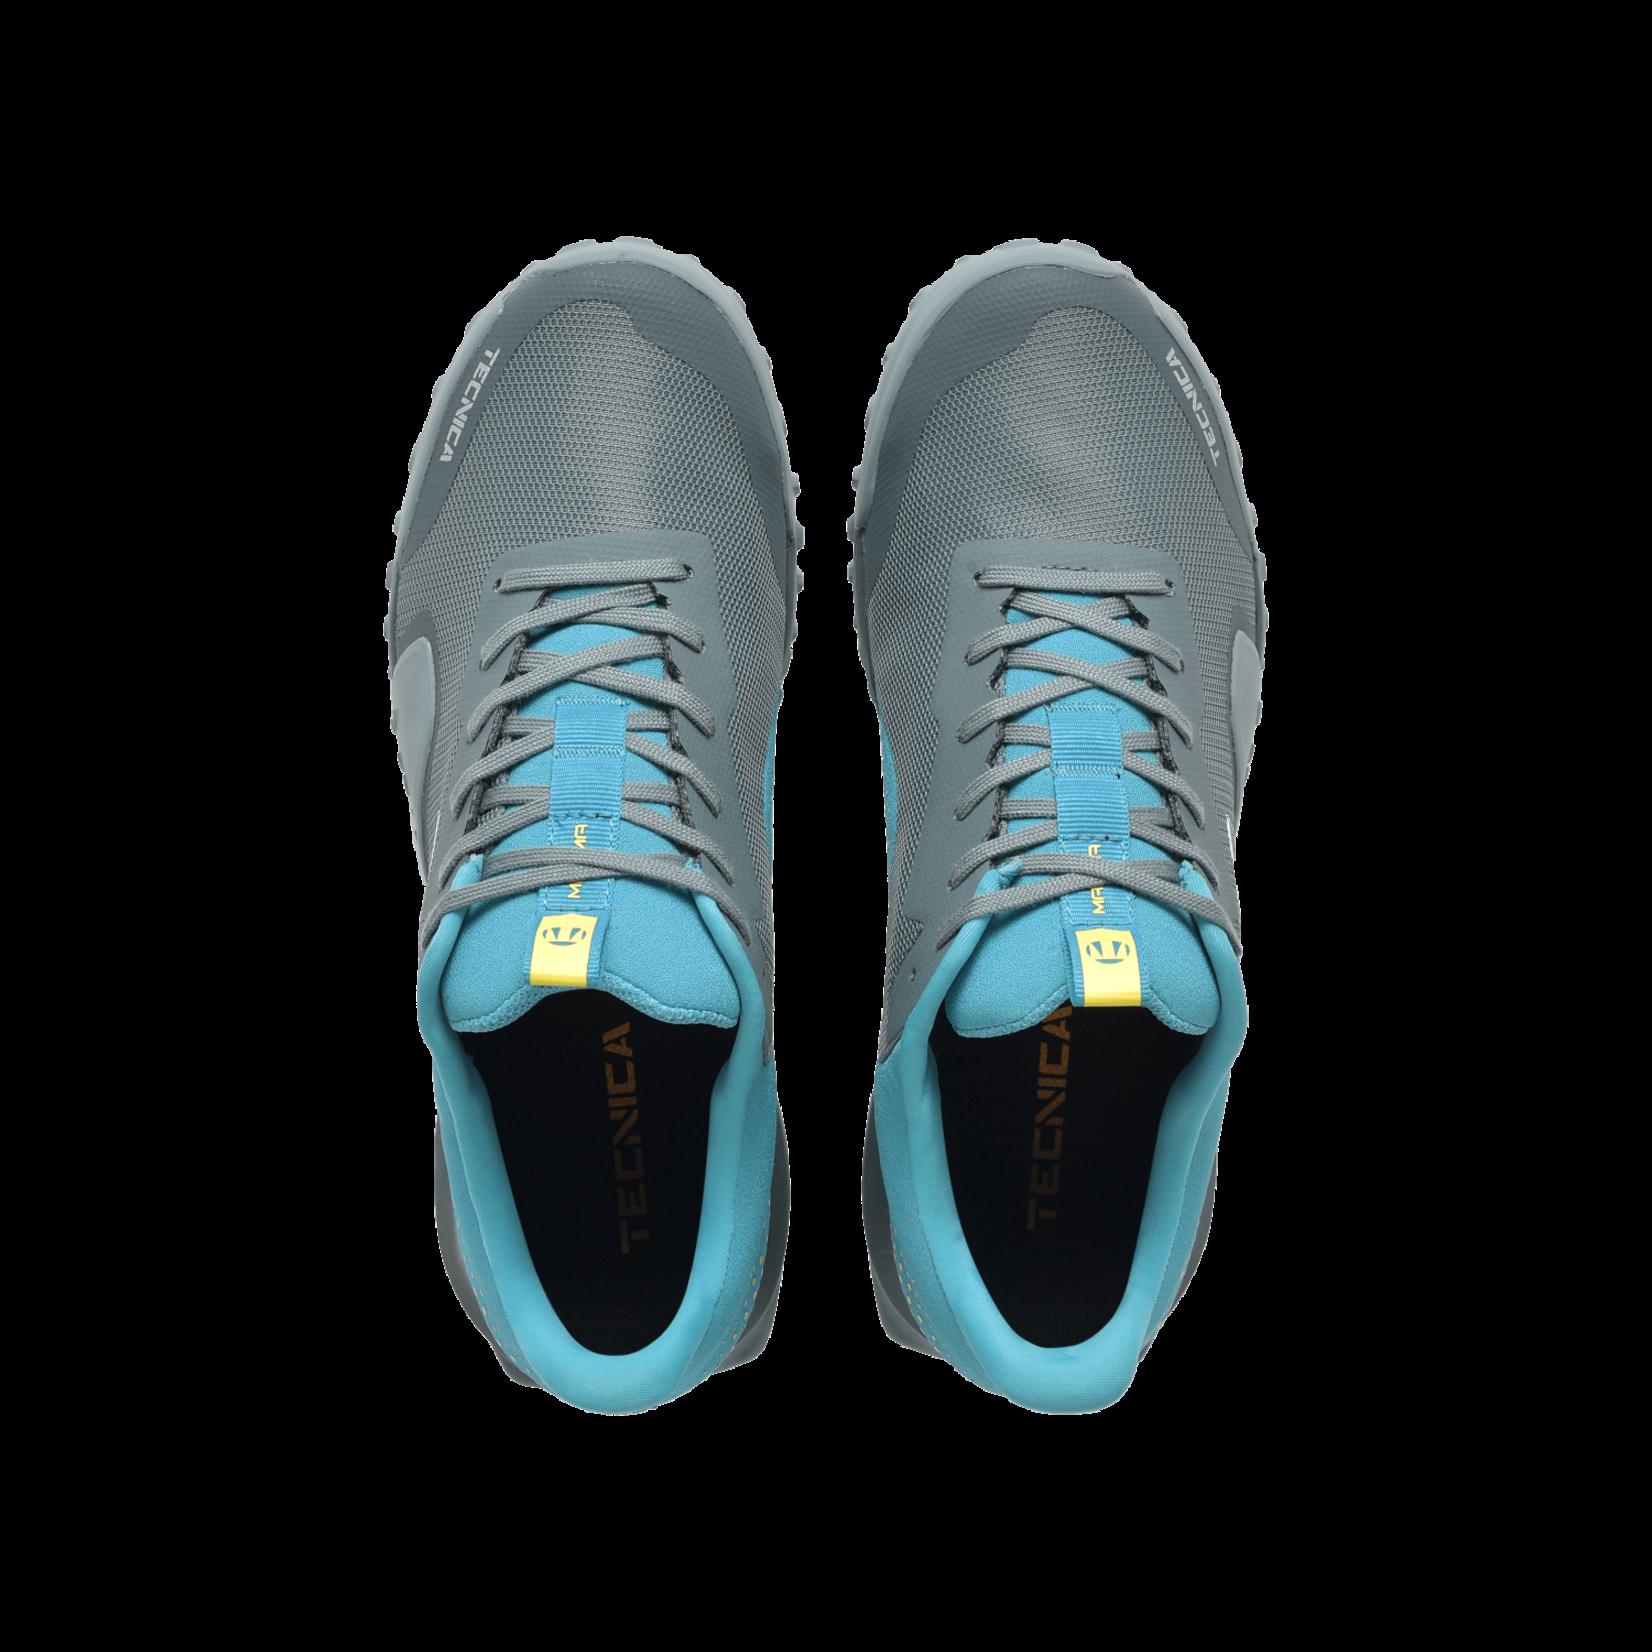 Tecnica Tecnica Magma S GTX Trail Shoe - Women